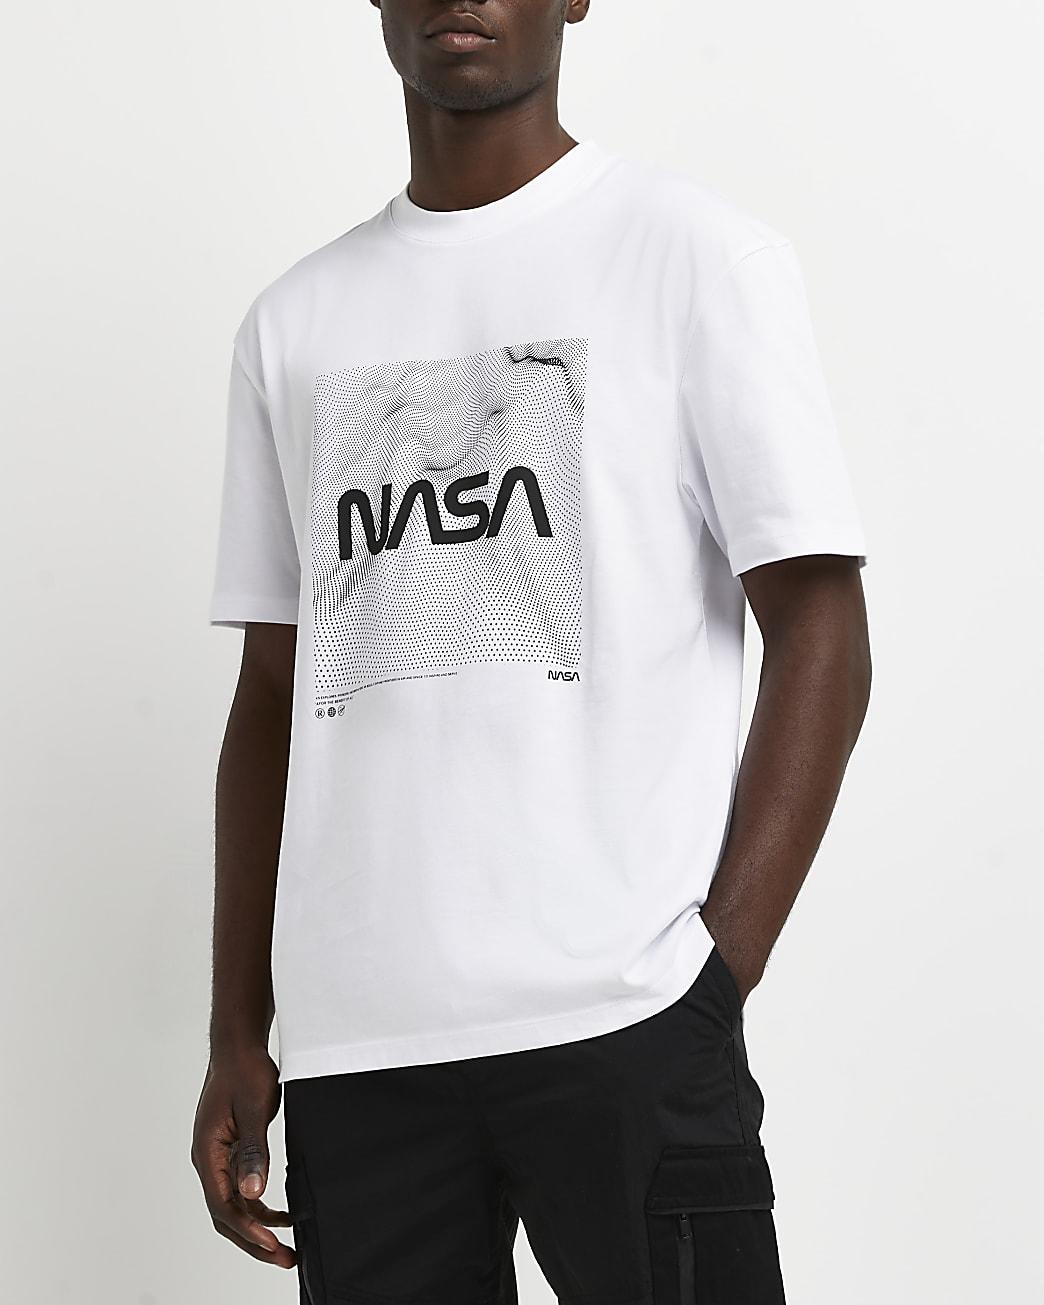 White regular fit NASA graphic t-shirt